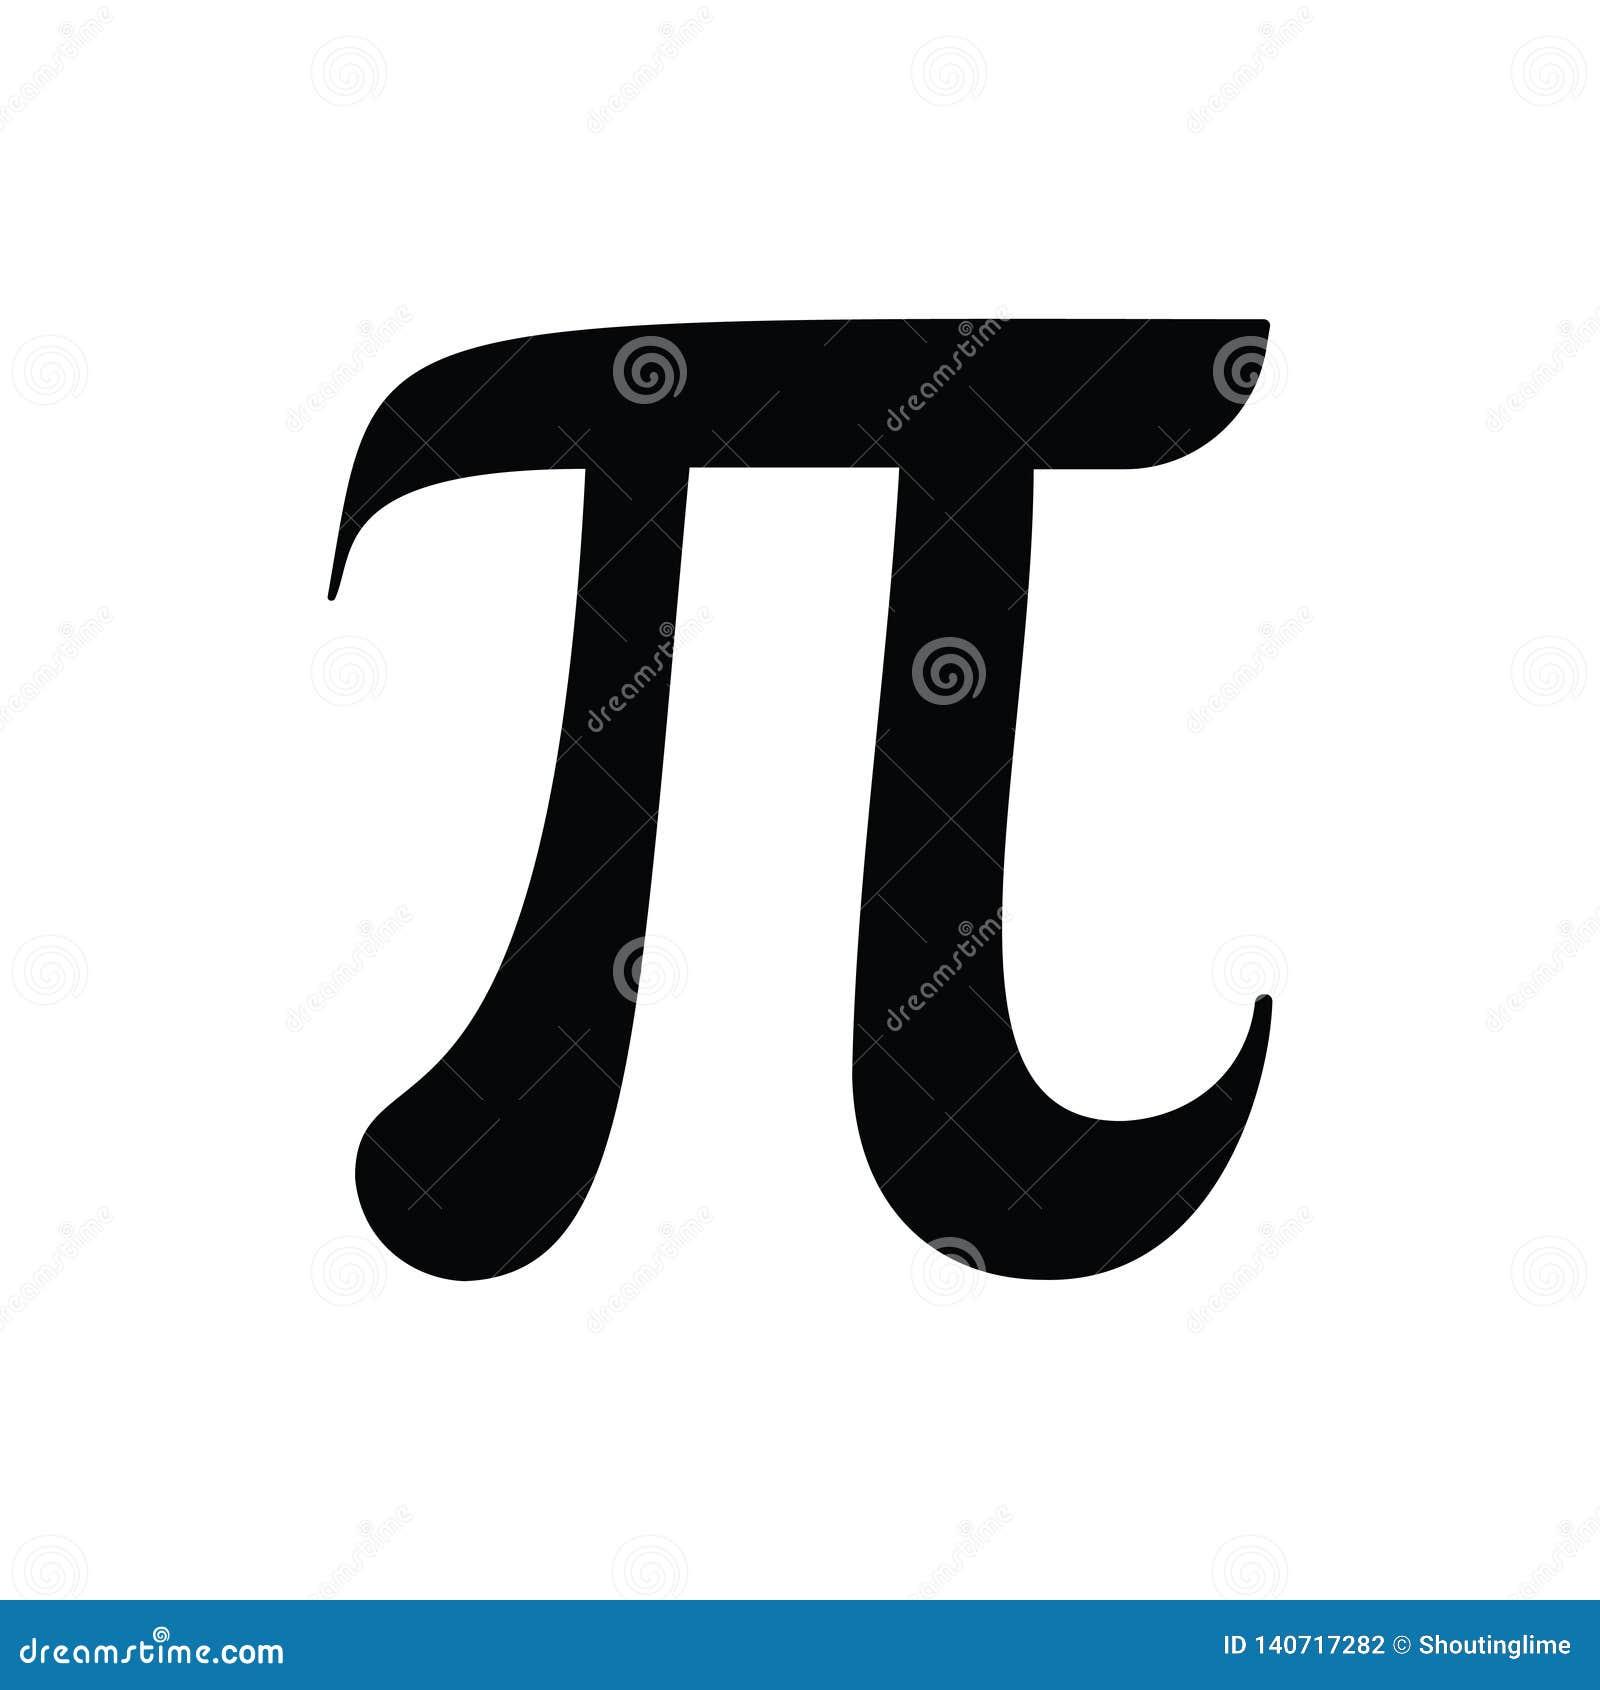 Pi Sign Vector Black Isolated on White Back